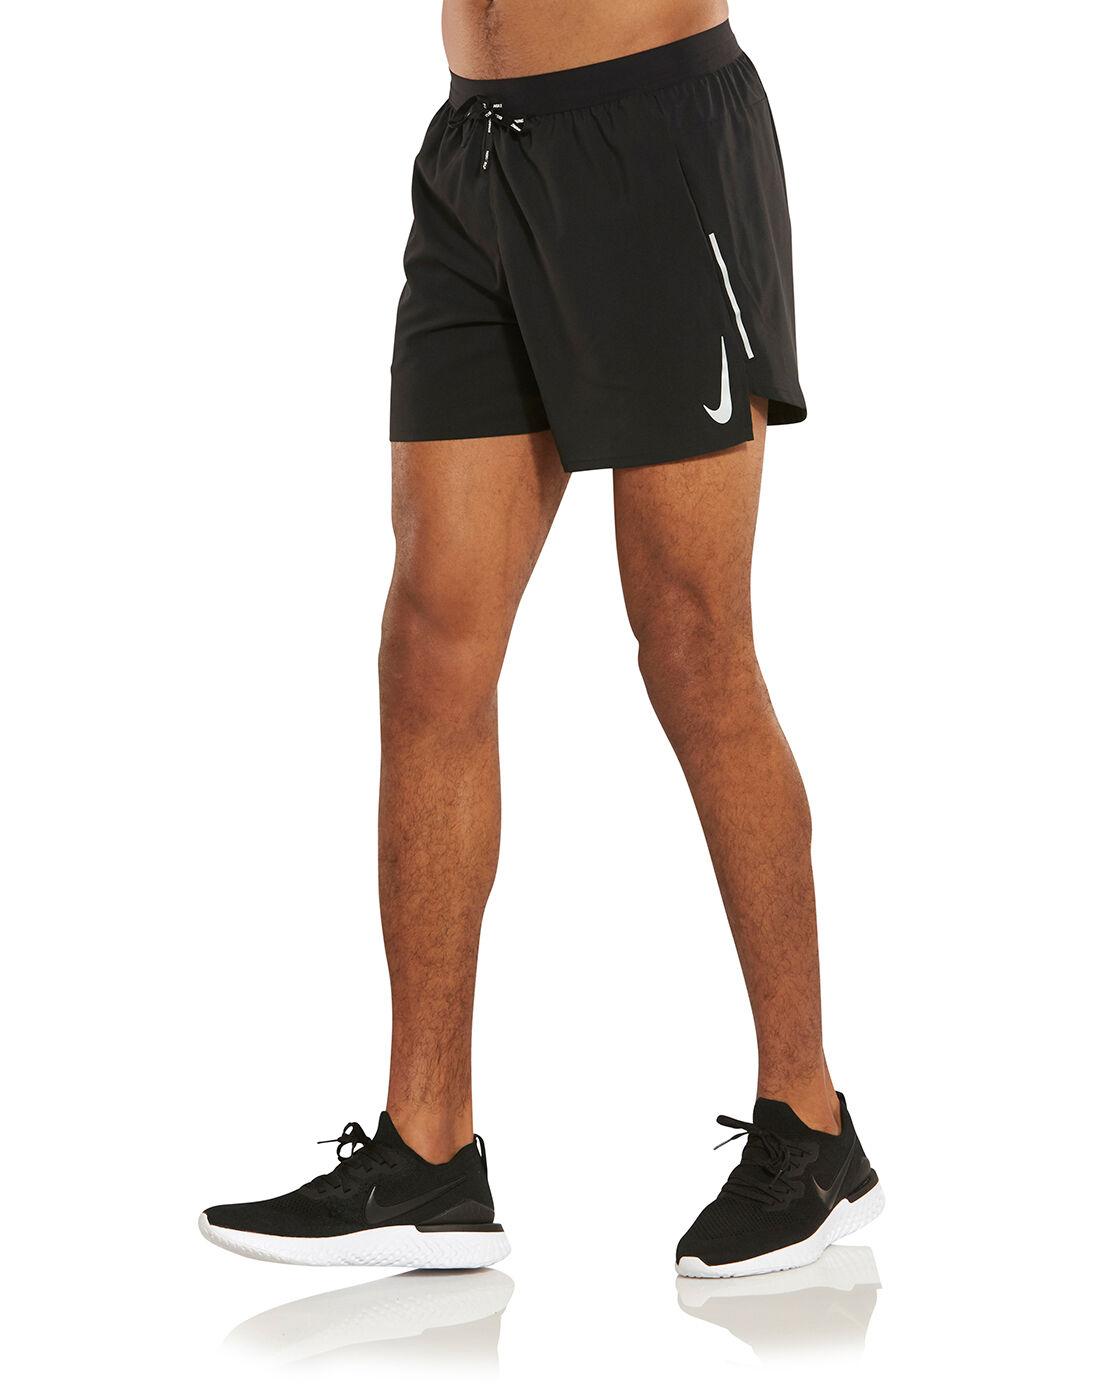 Nike Mens Flex Stride 5 Inch Shorts